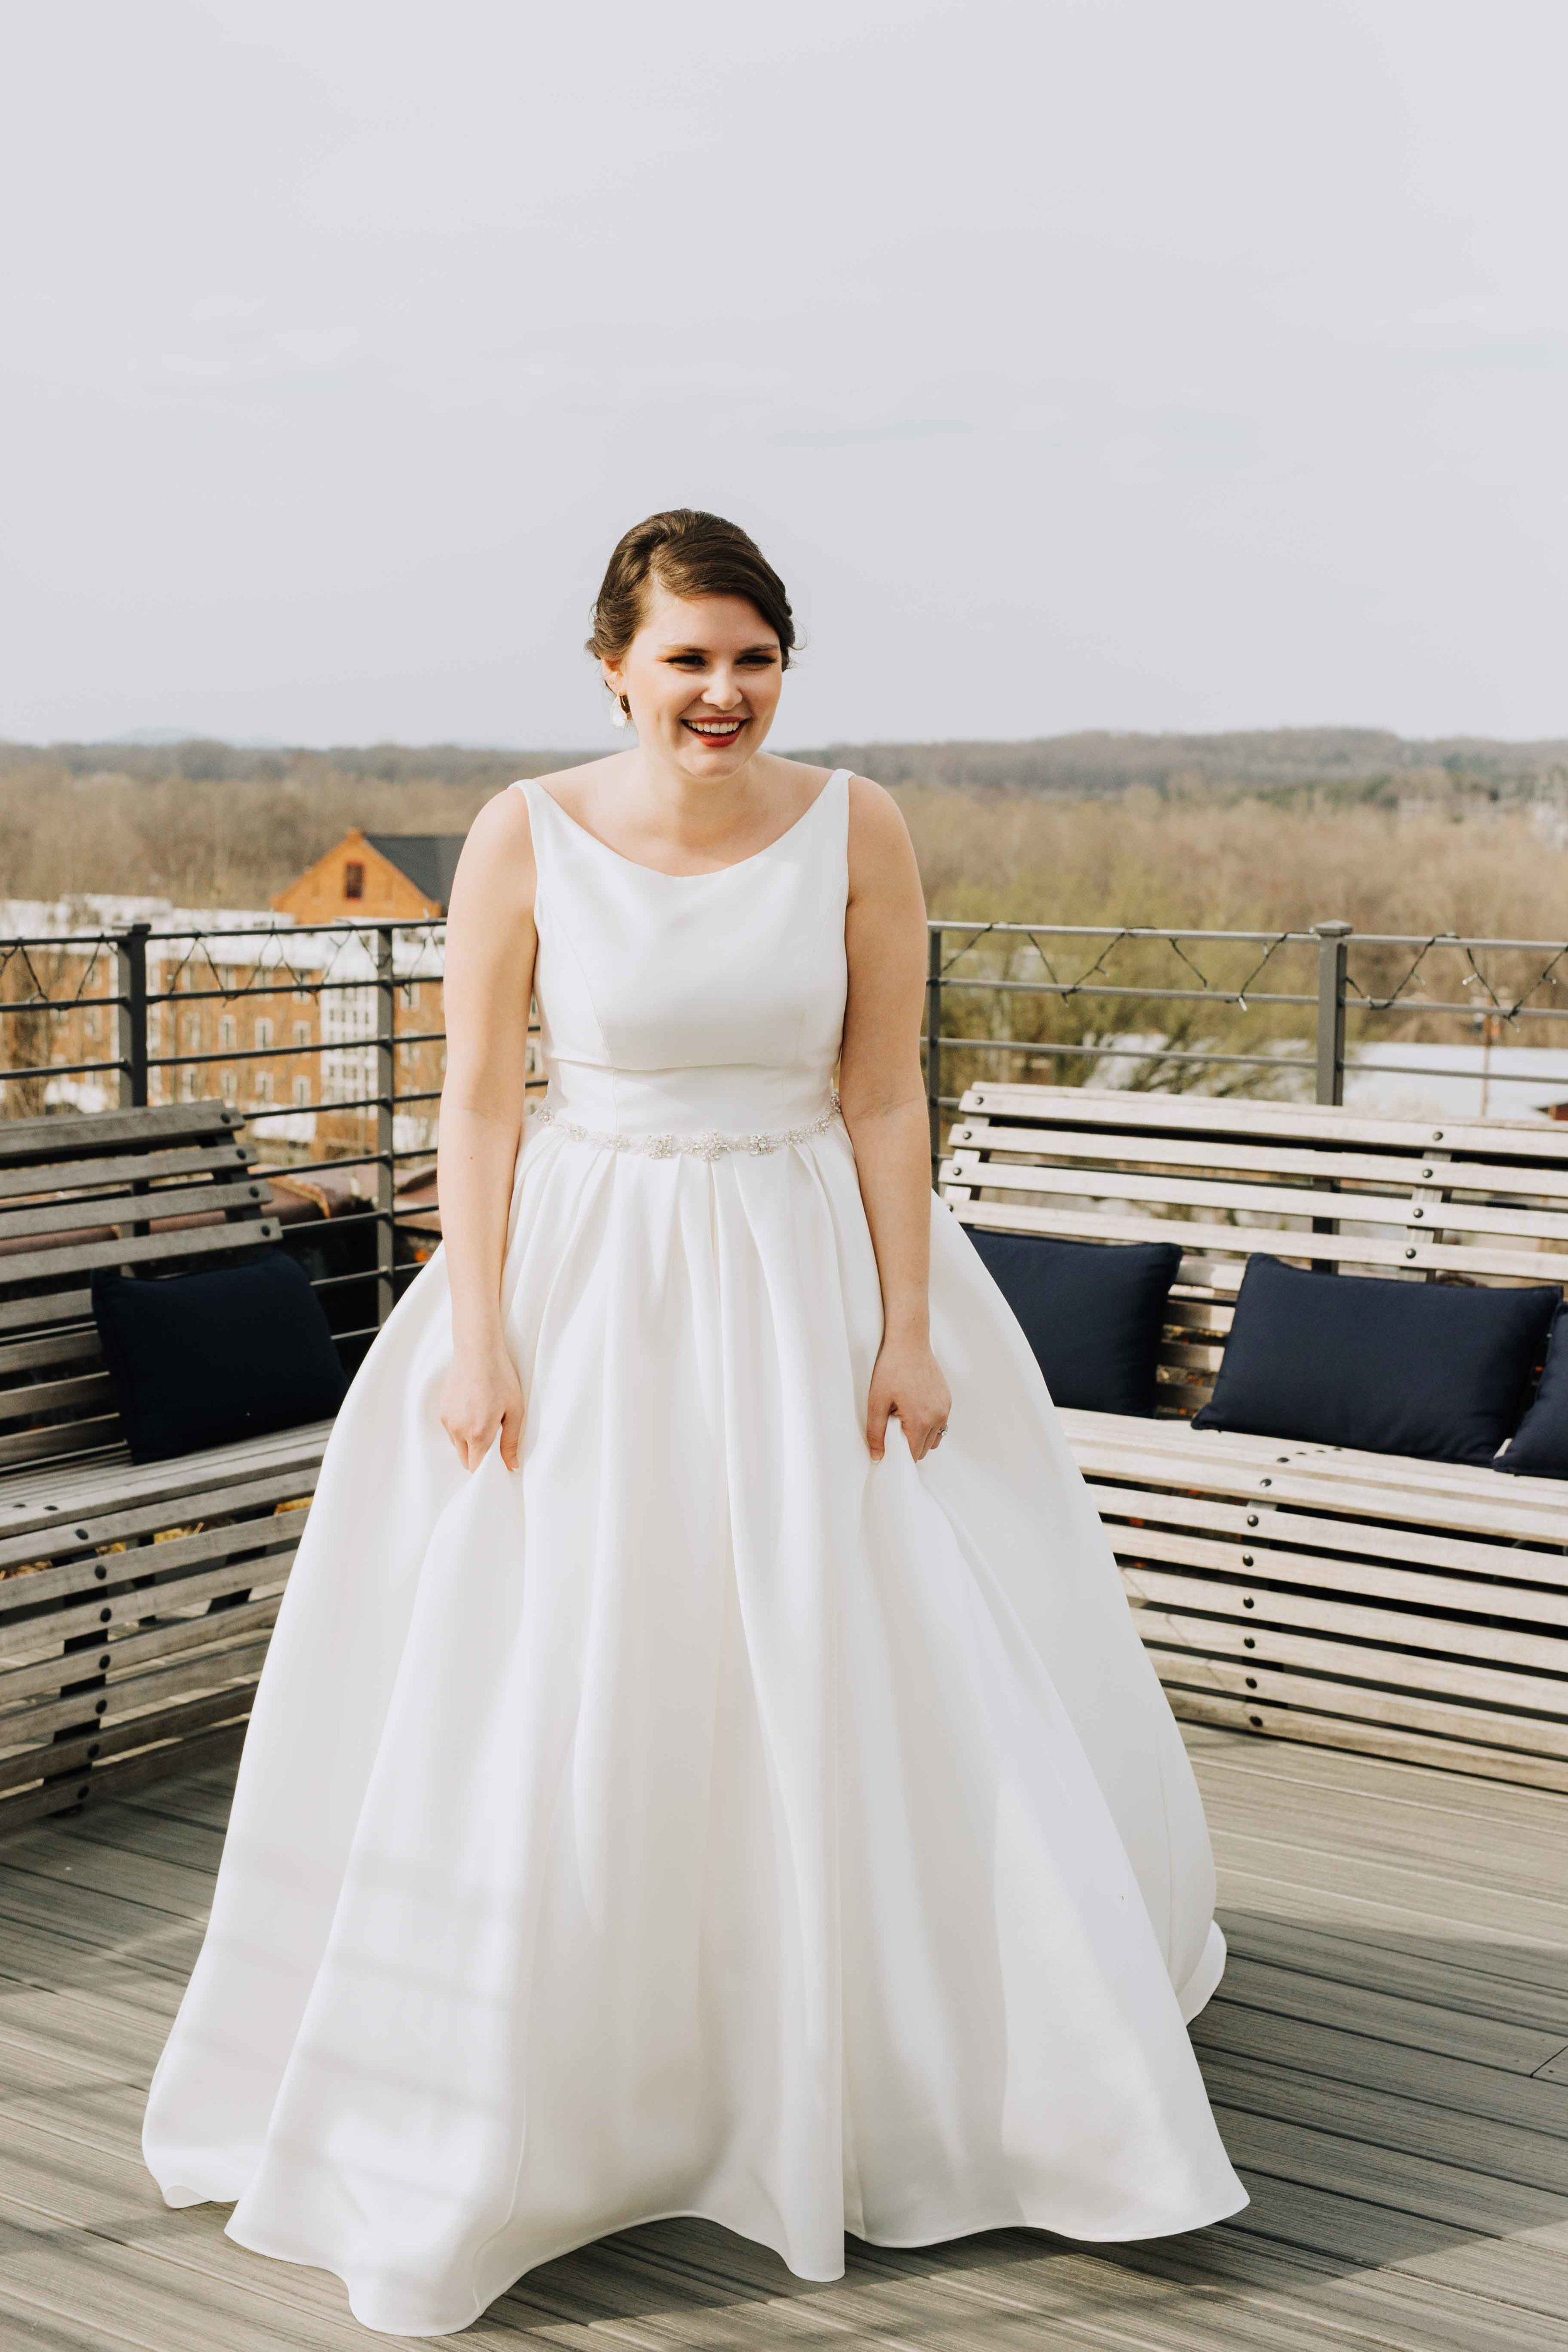 Farmville-Virginia-Wedding-Hotel-Weynoke-Downtown-Jacqueline-Waters-Photography-Detailed- (349).jpg